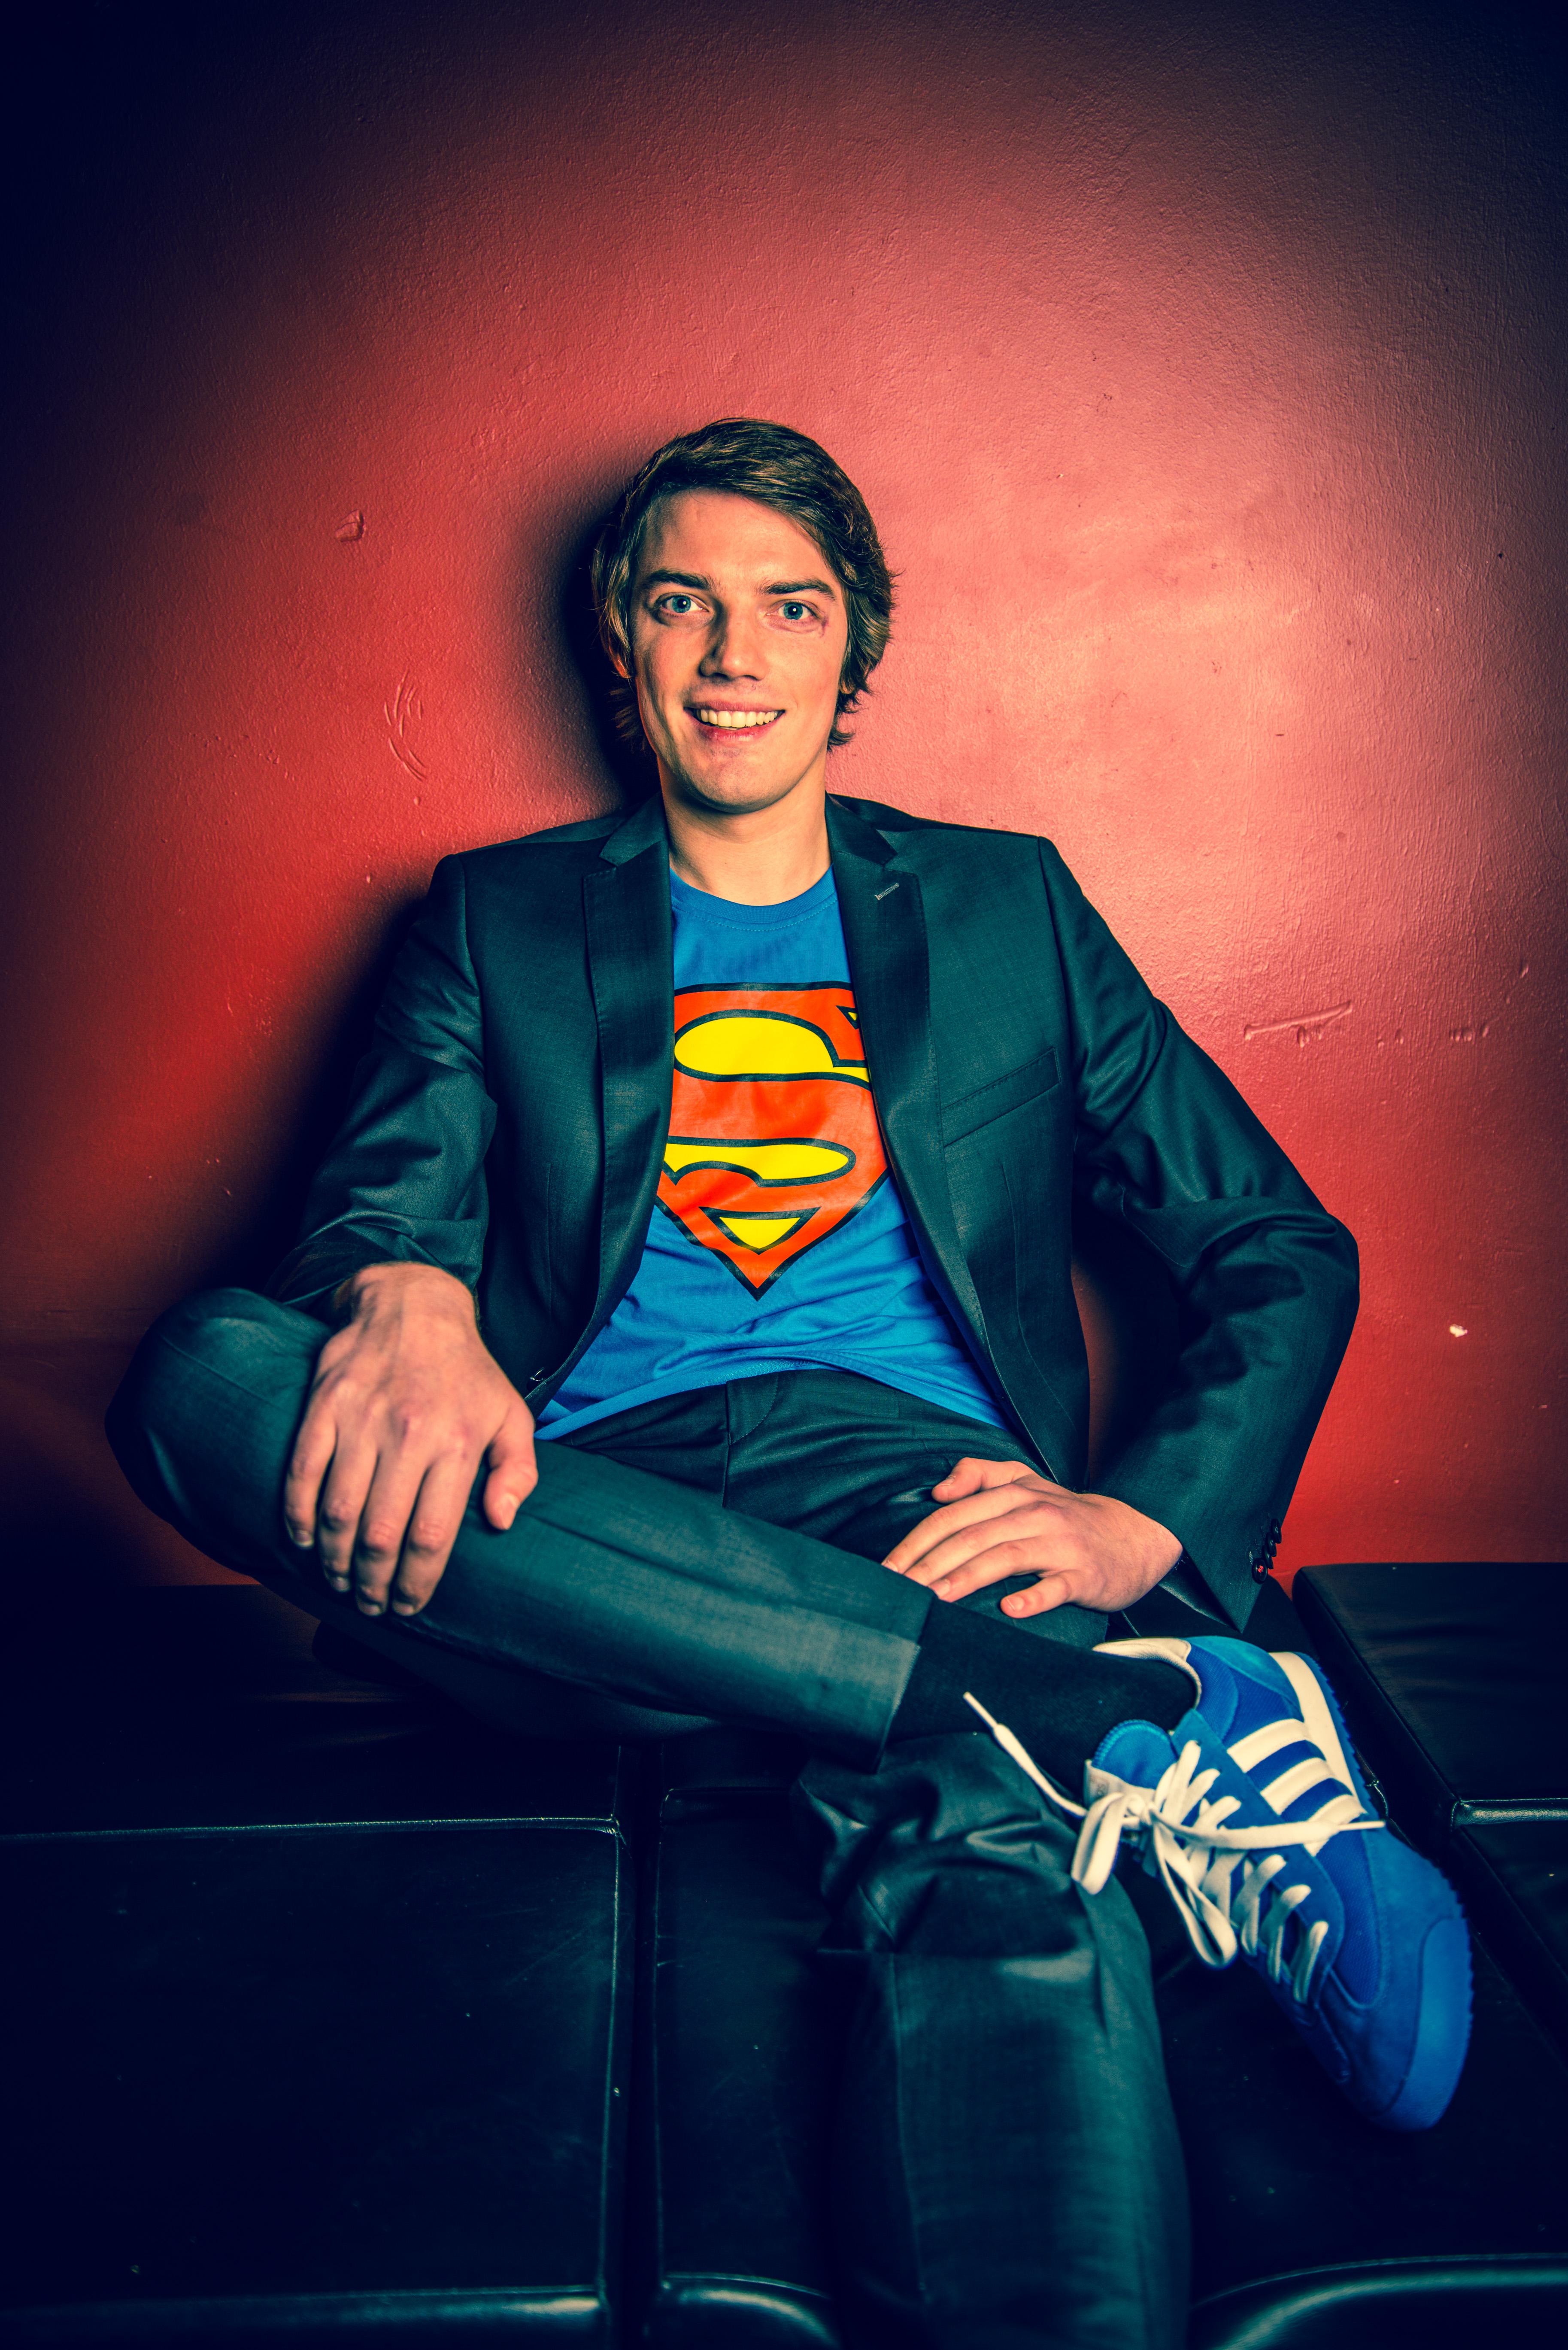 Super Hannes